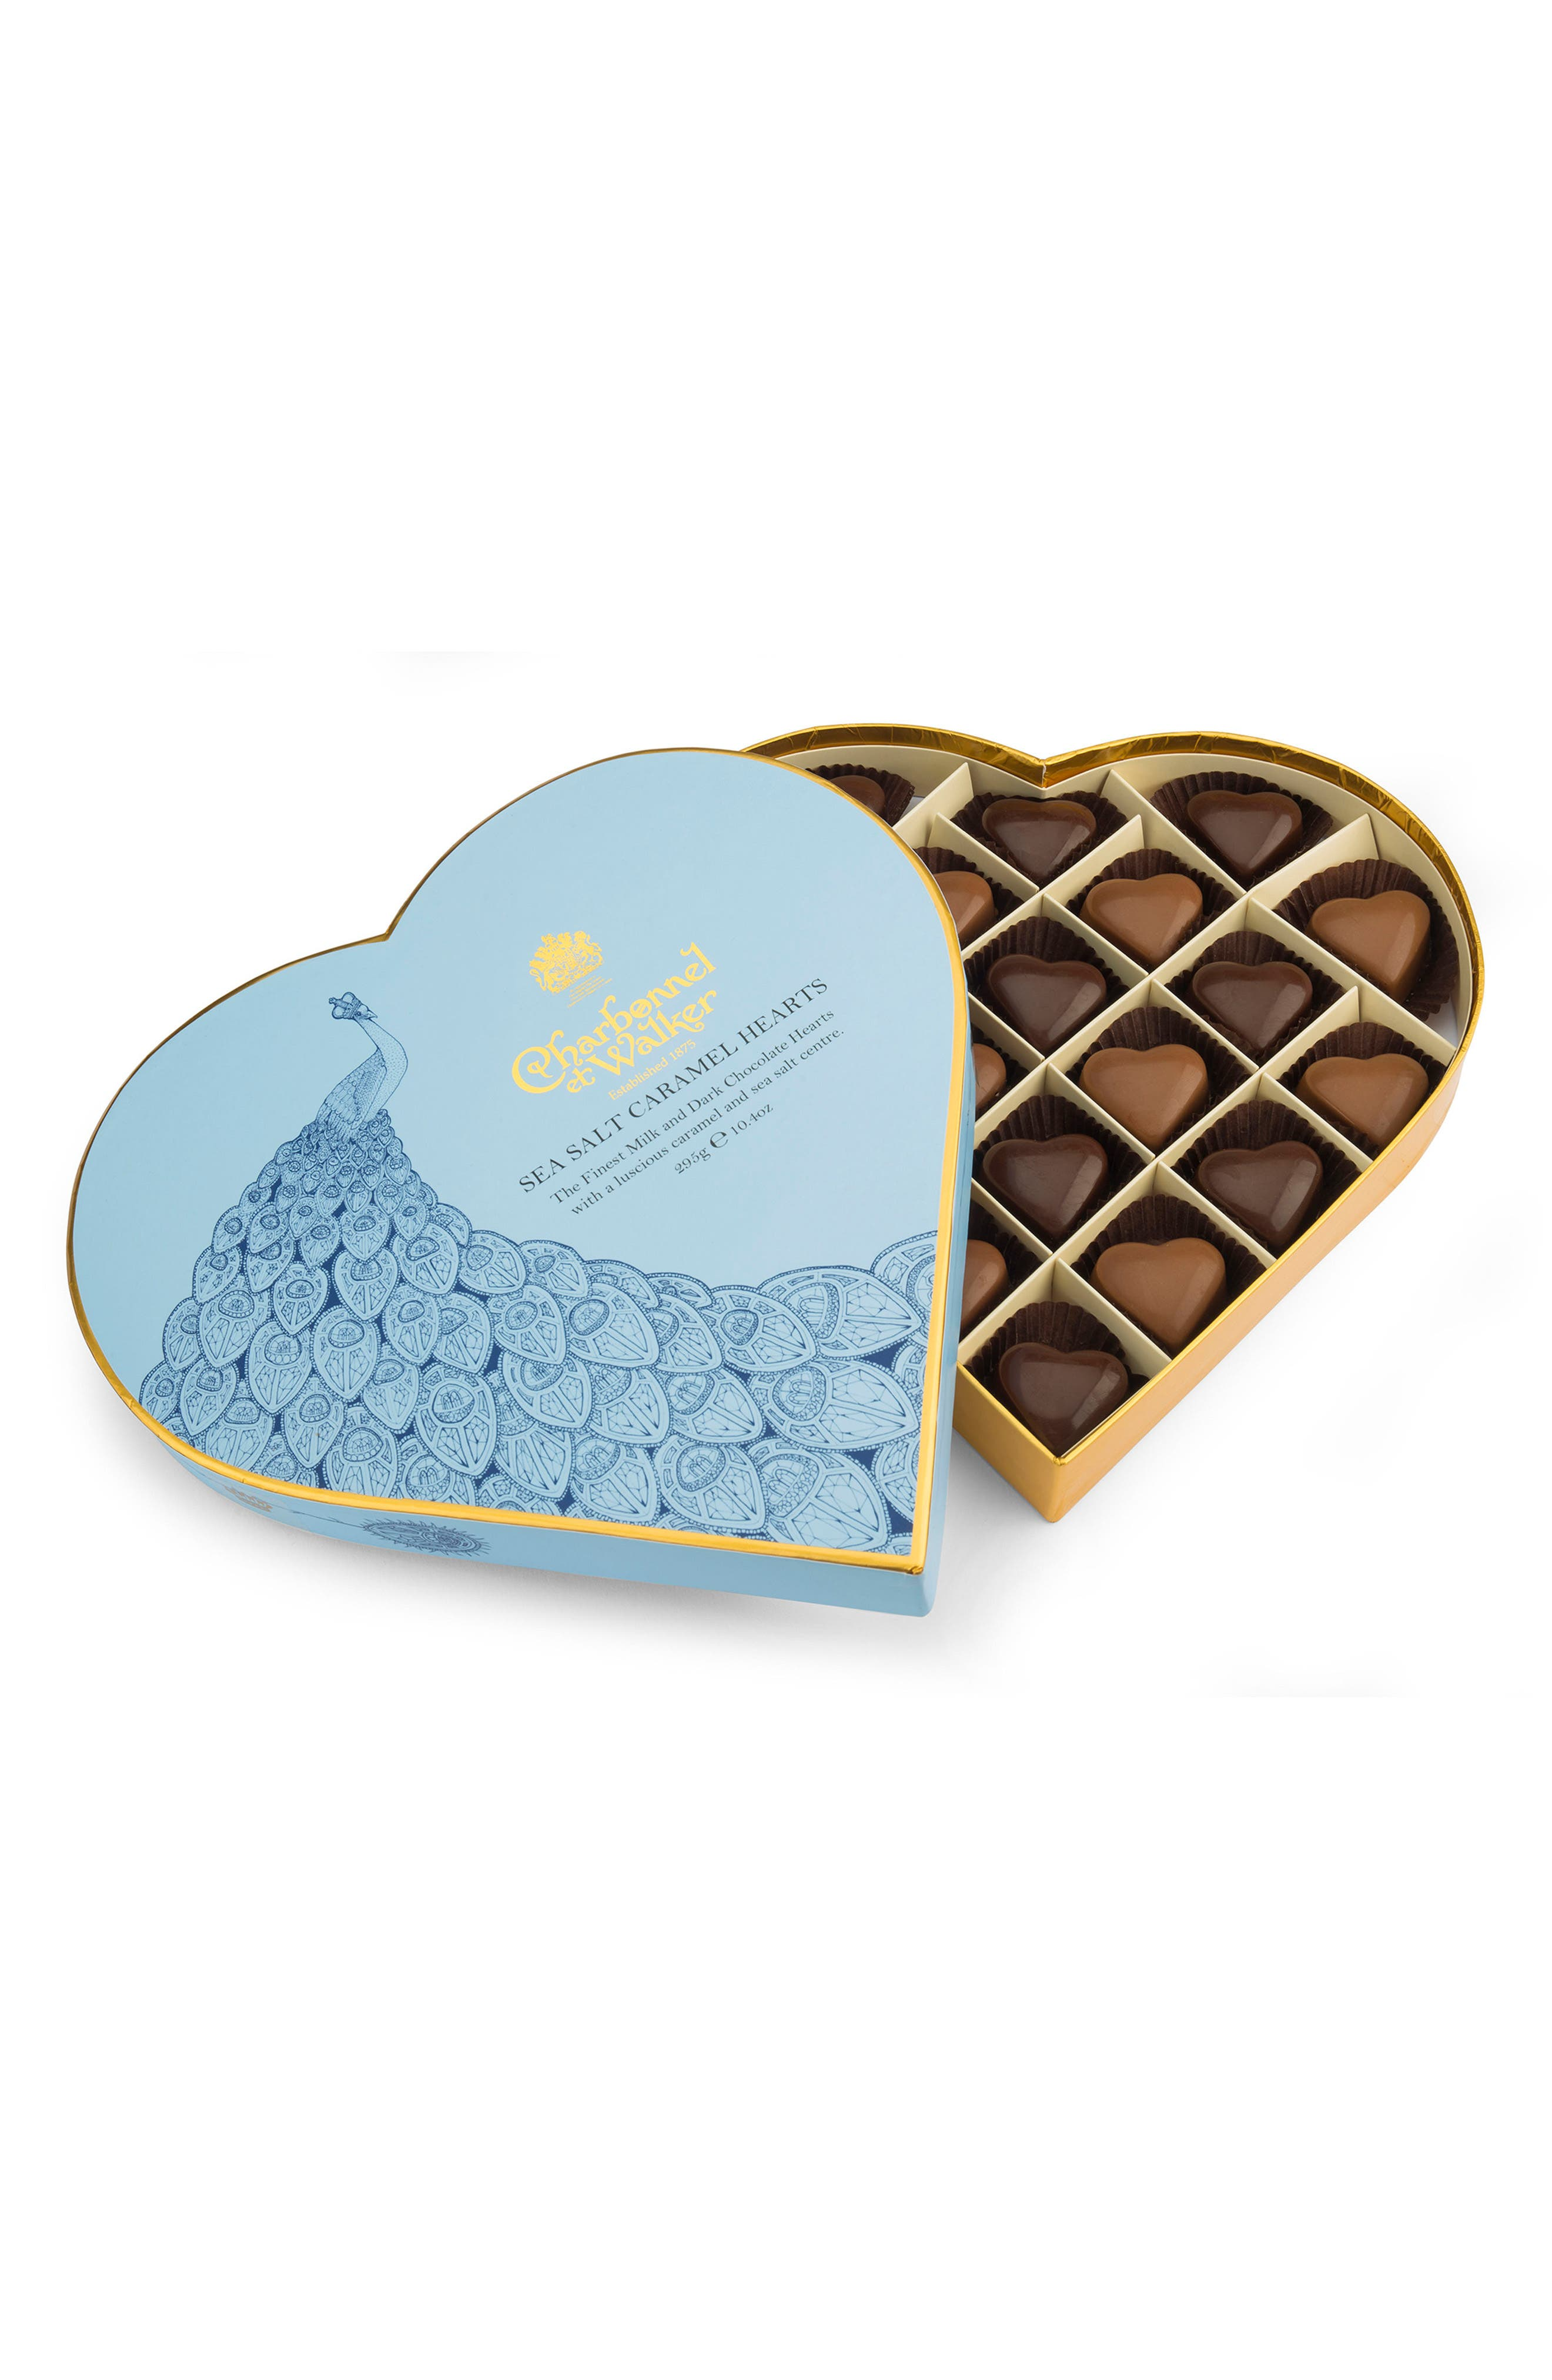 Sea Salt Caramel Chocolates in Heart Shaped Gift Box,                             Main thumbnail 1, color,                             400